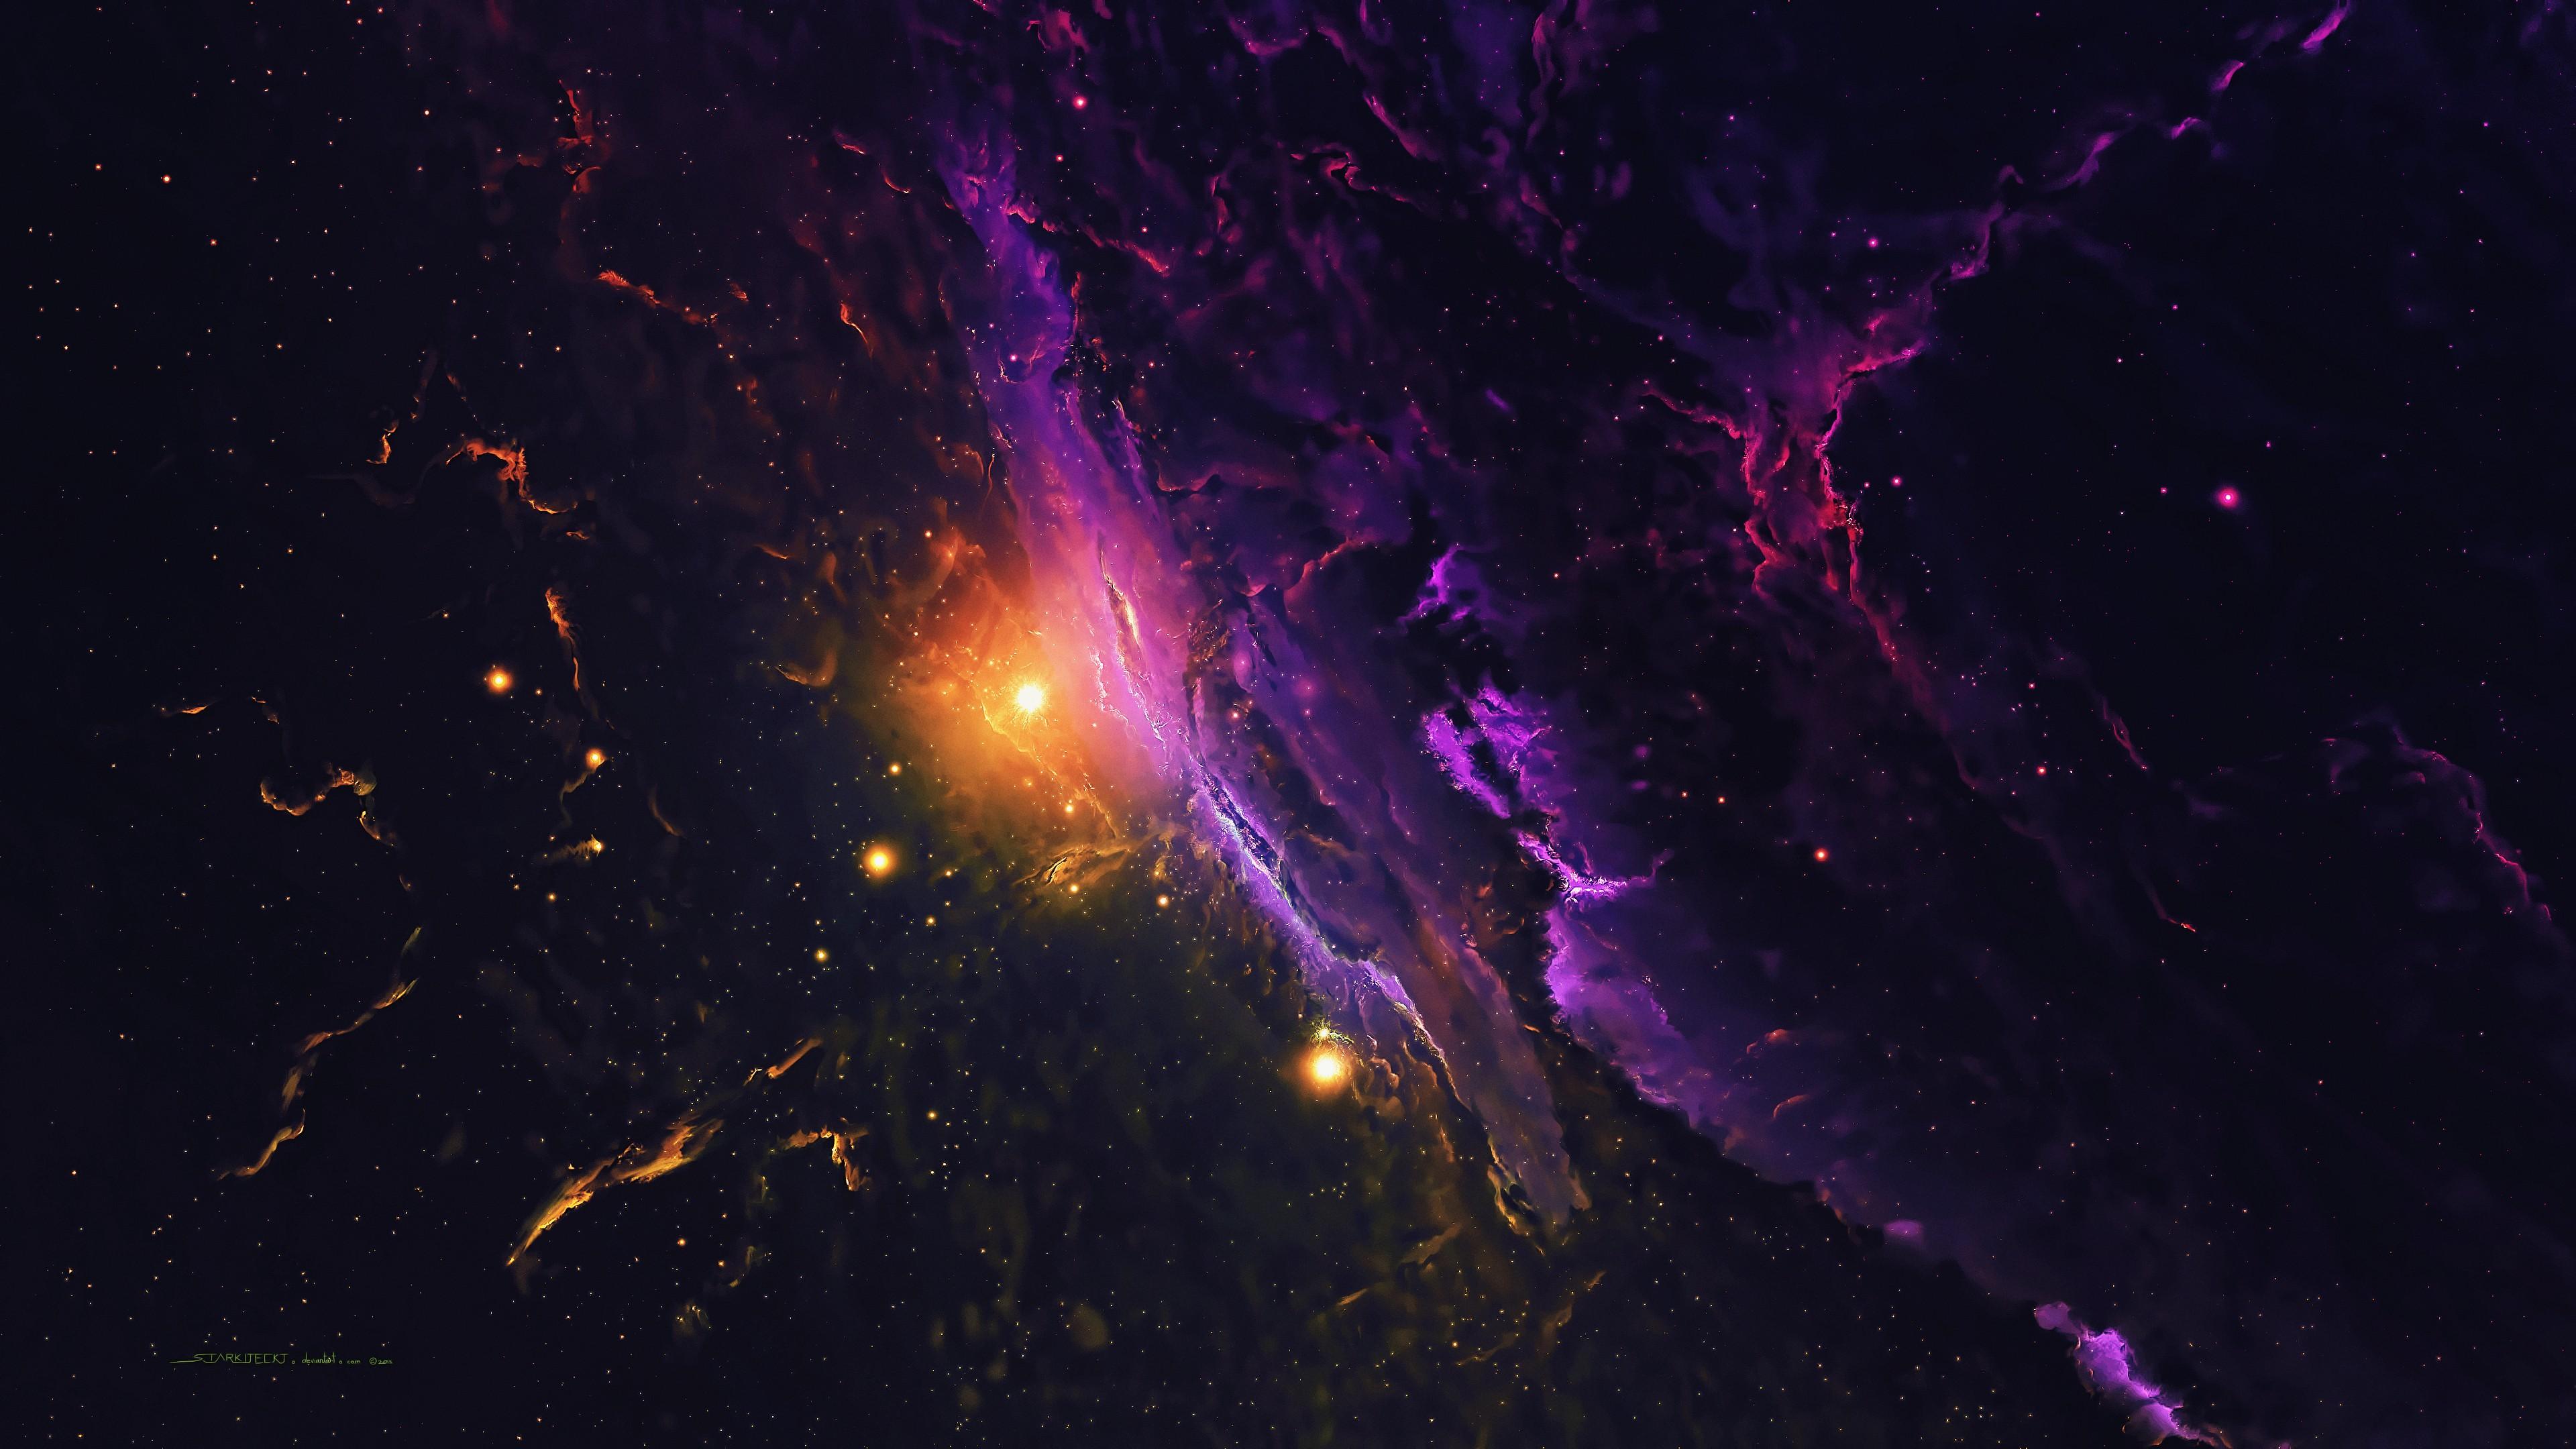 galaxy 3840x2160 space 4k 20329